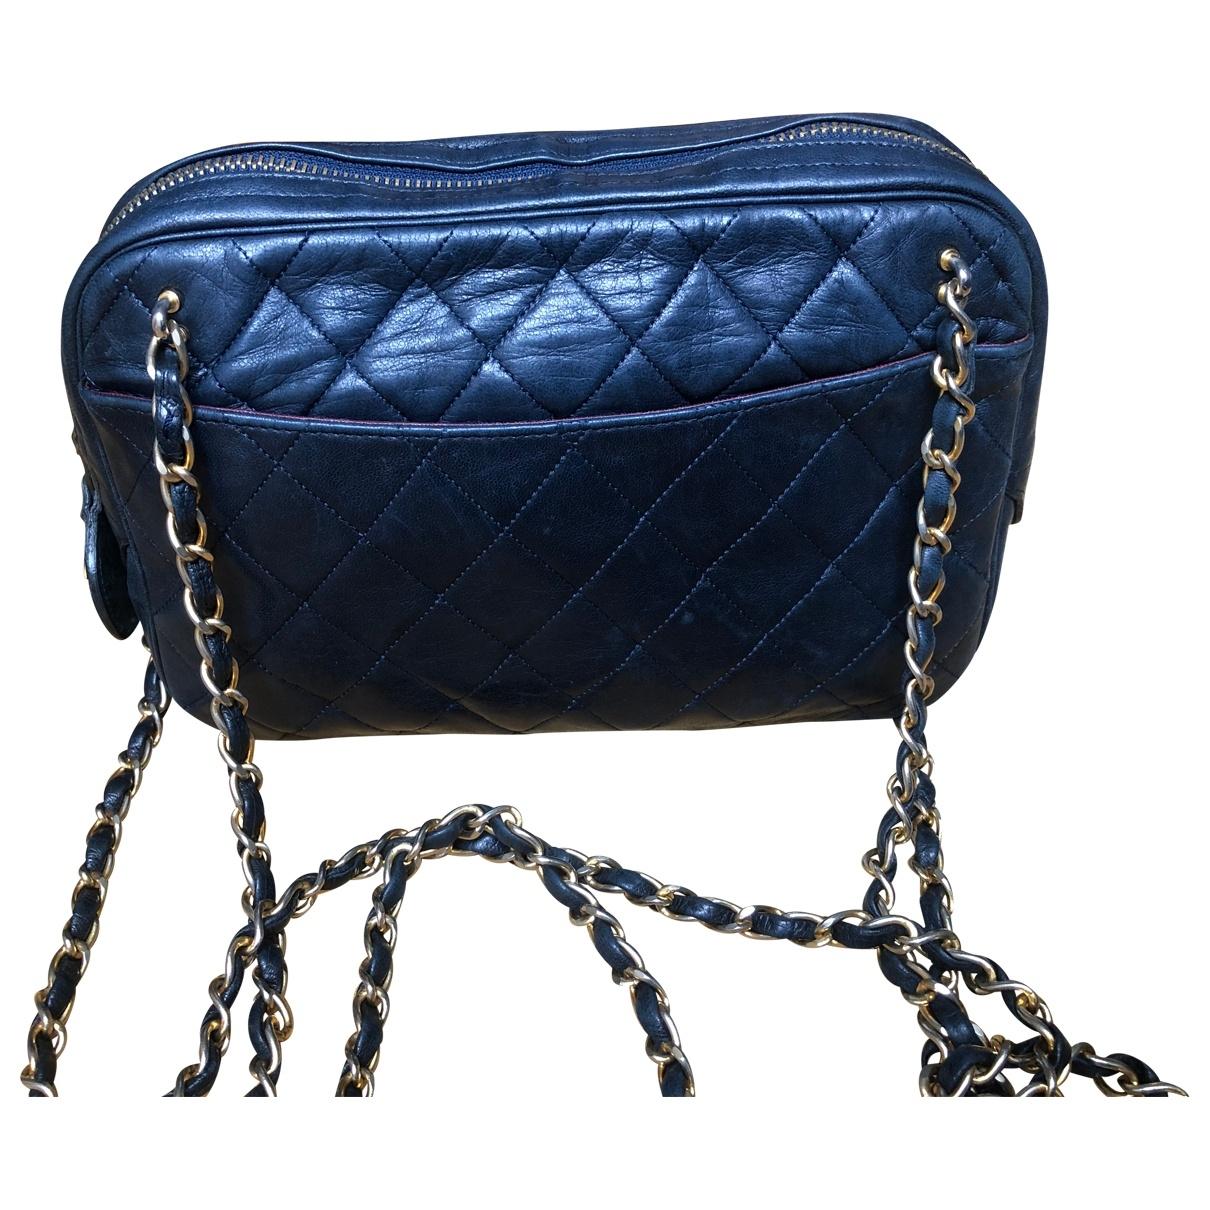 Chanel Camera Handtasche in  Marine Leder